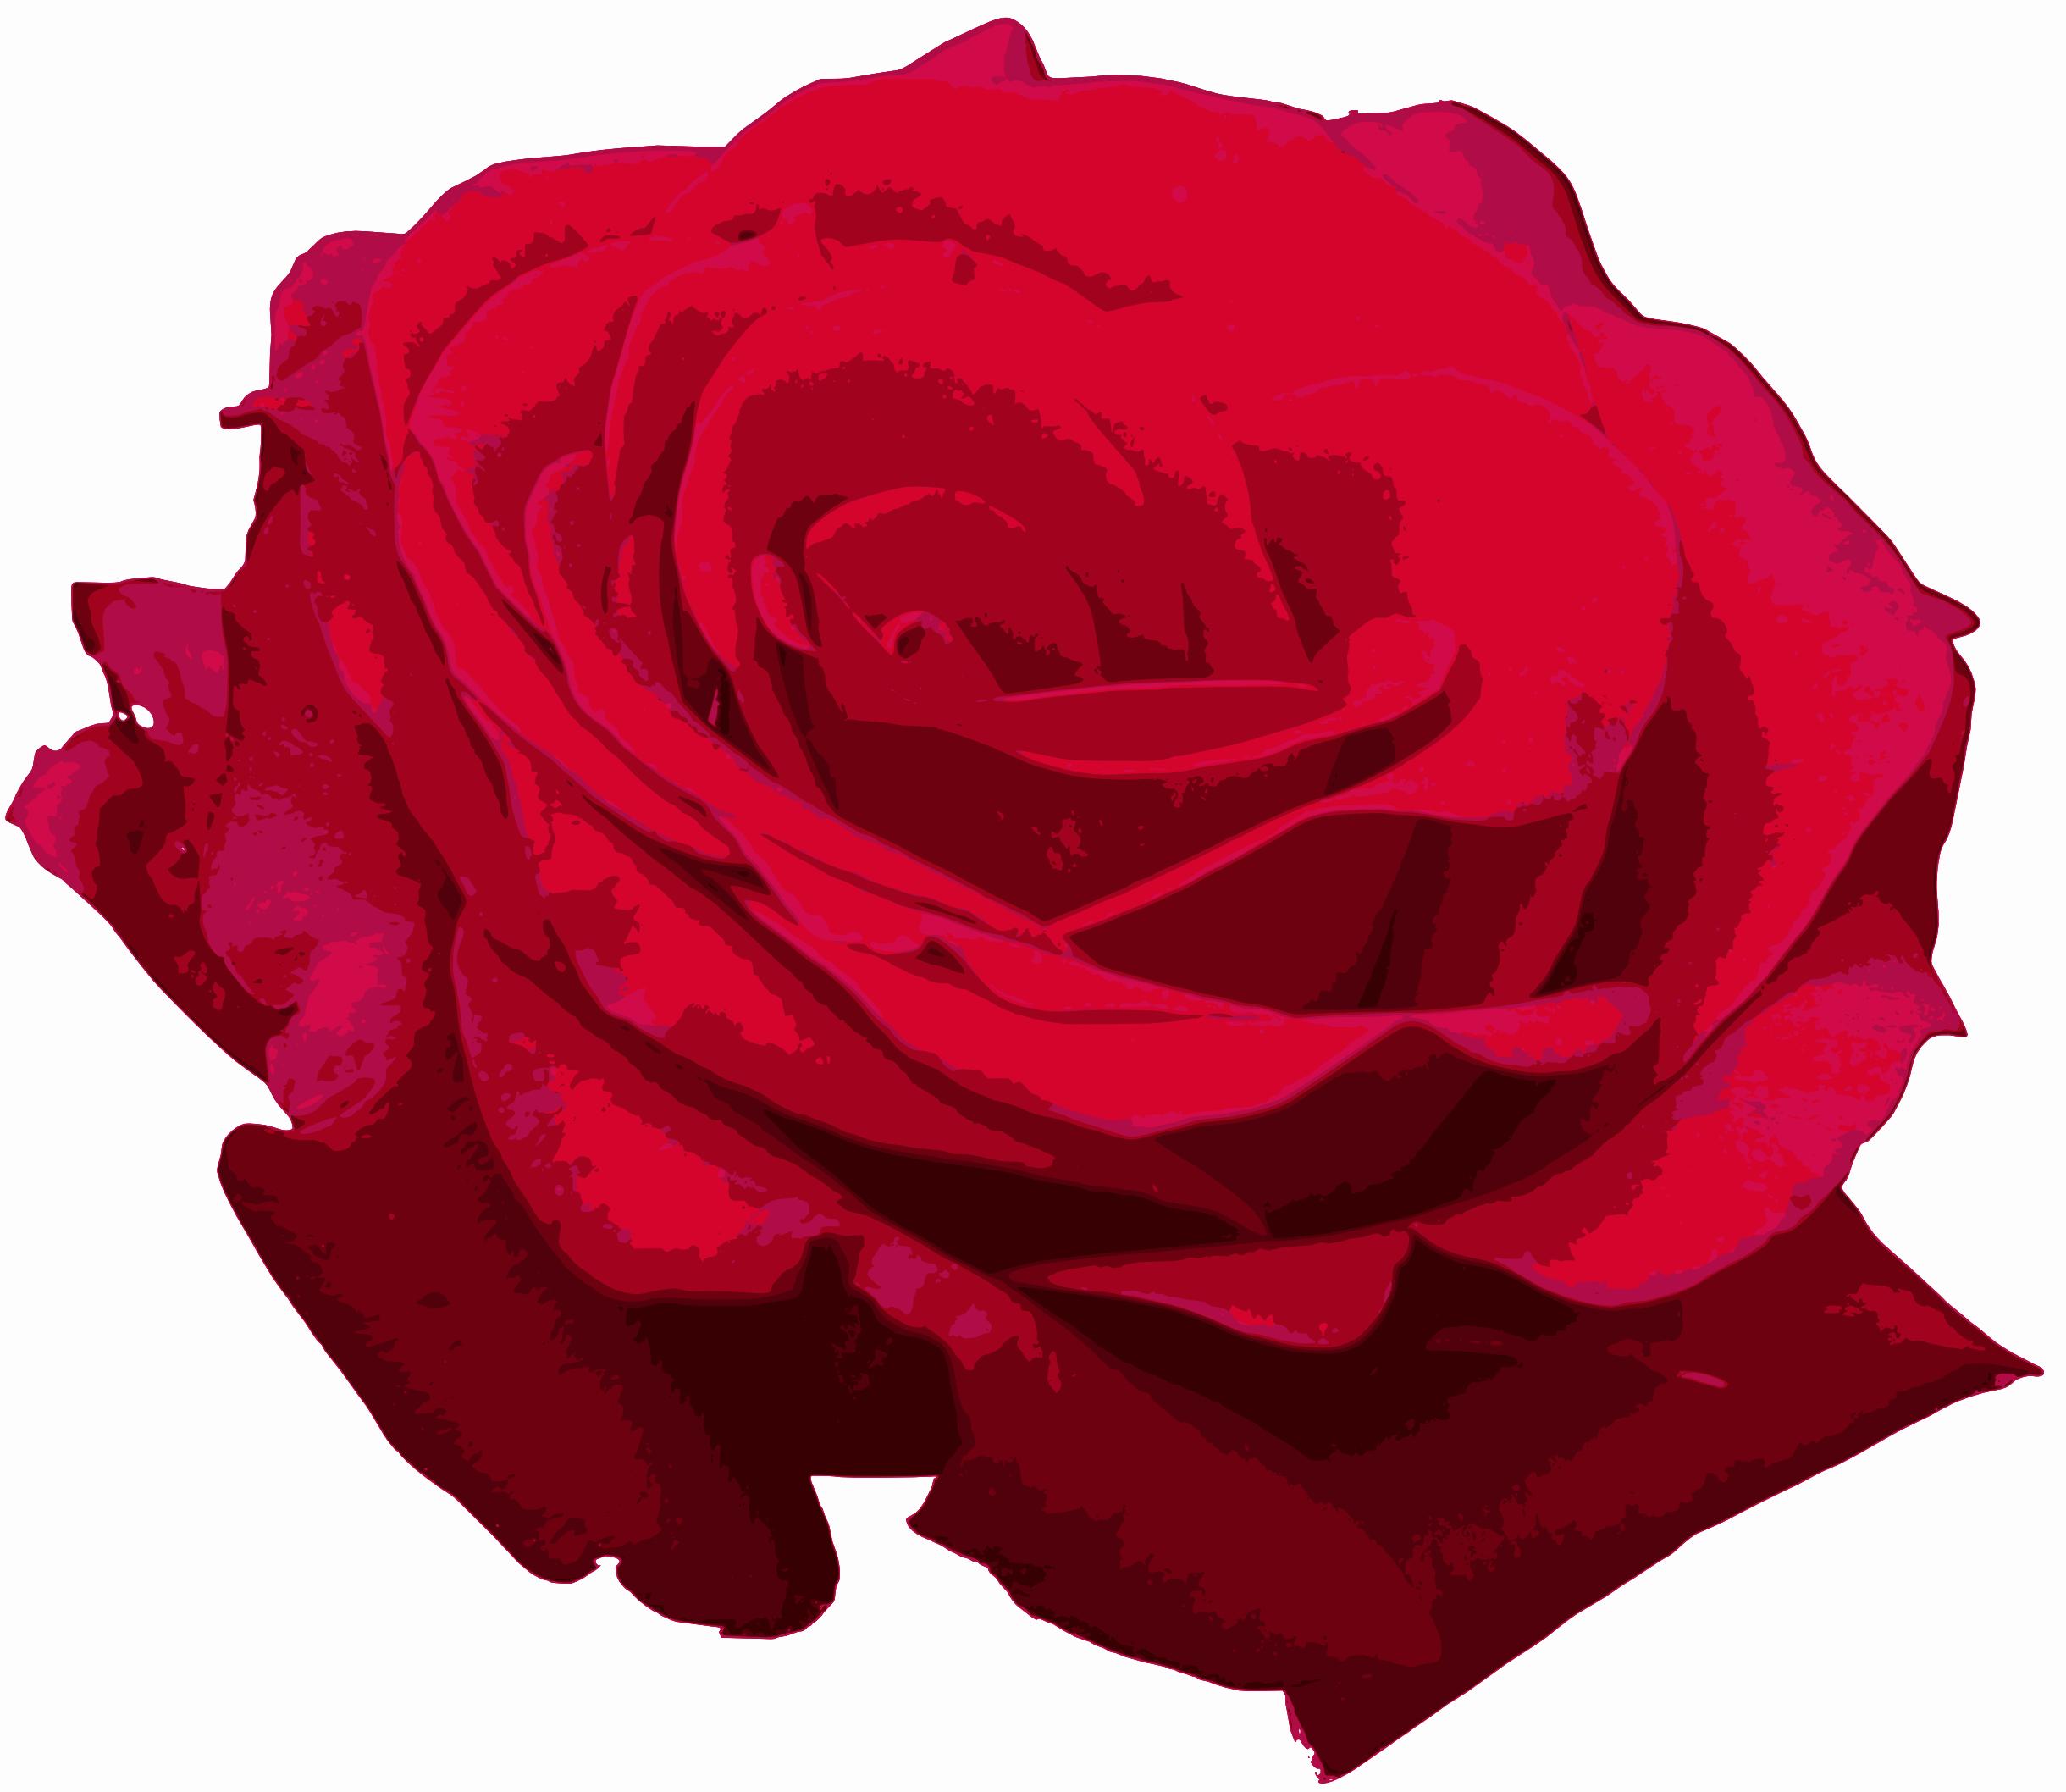 red rose png image transparent onlygfx com free clip art rose bouquet free clip art rose quartz